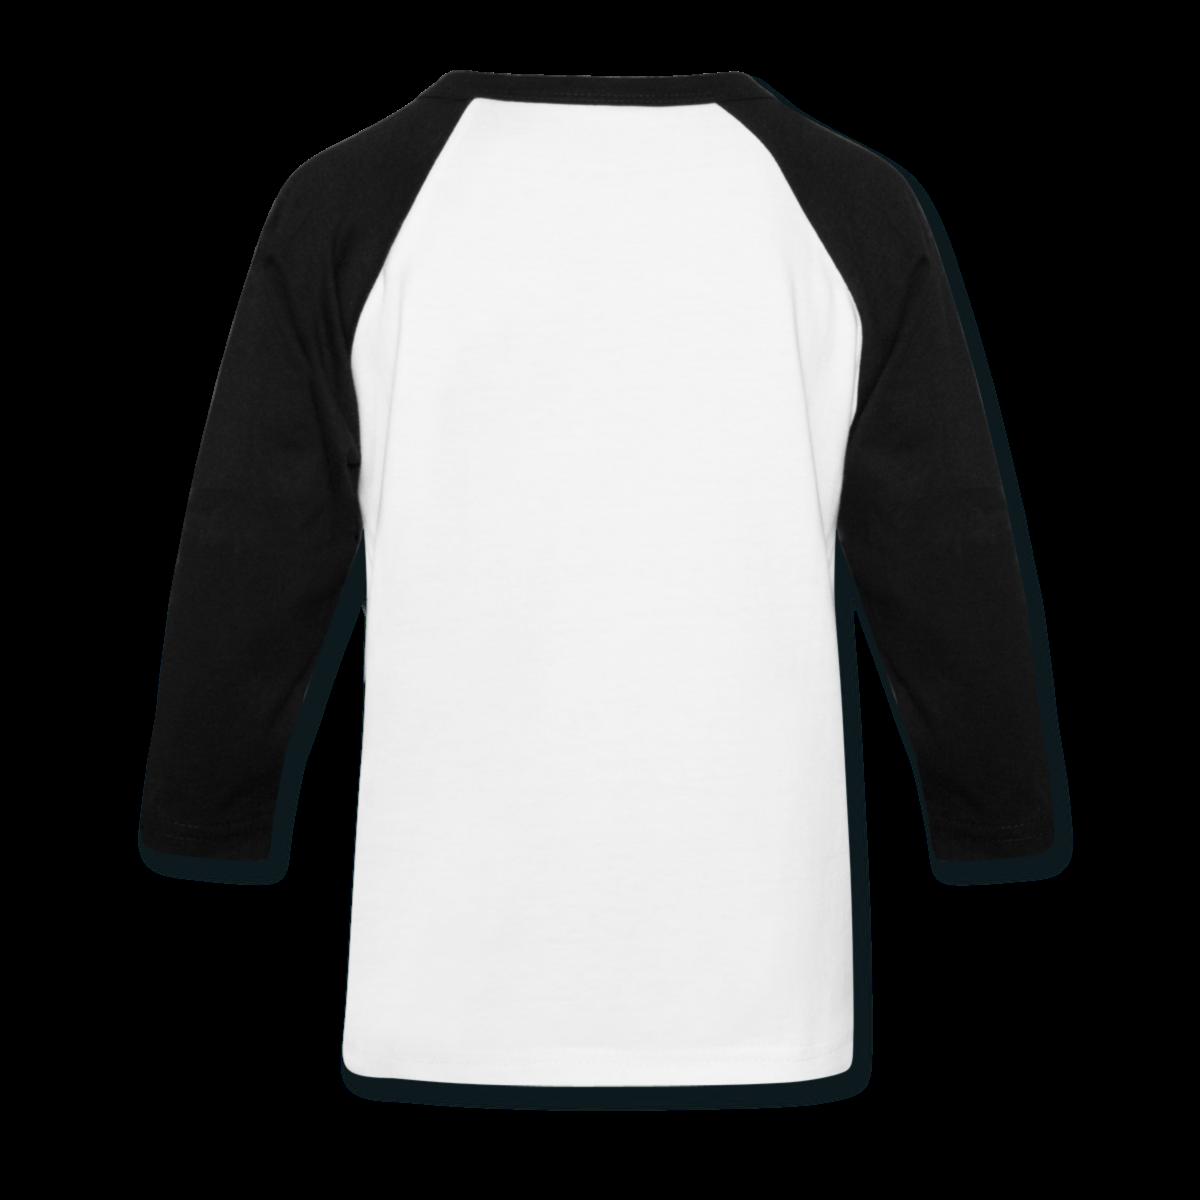 Black t shirt back and front plain - Plain White Tee Google Search